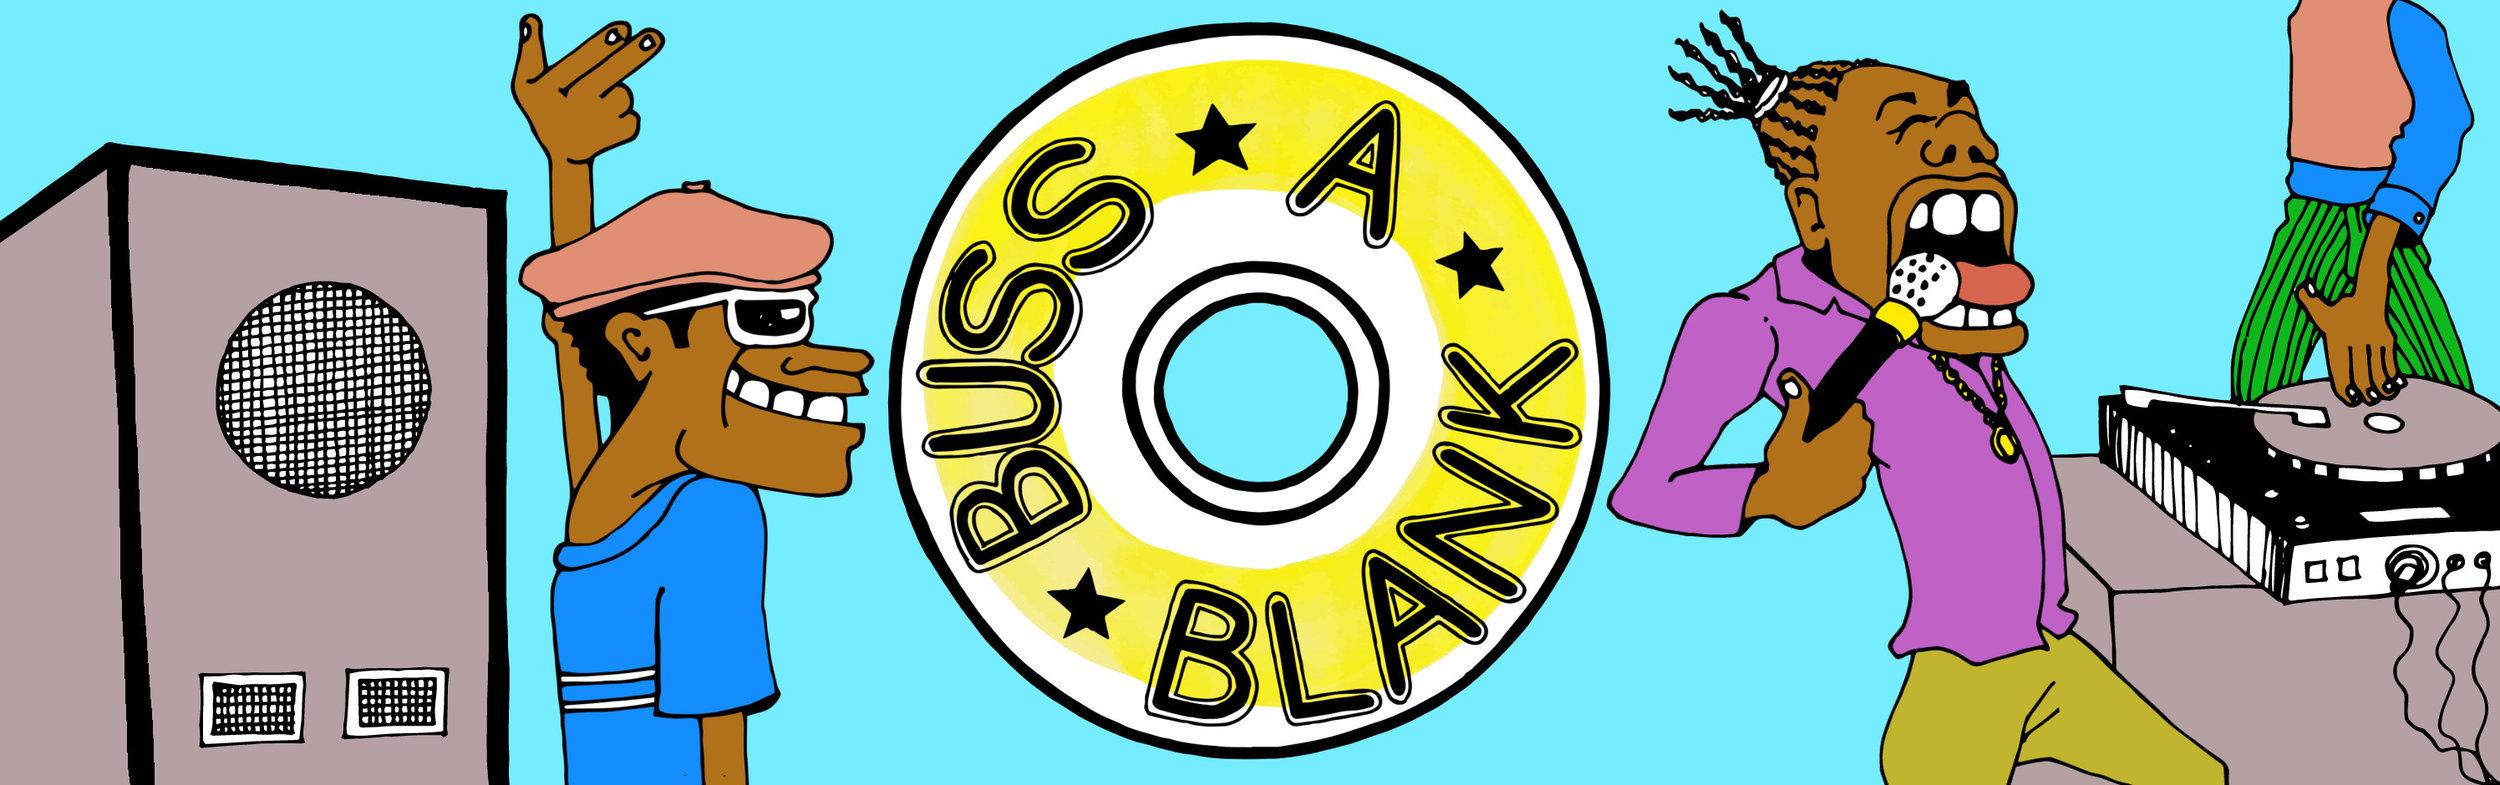 Buss A Blank - Identity Artwork & Logo